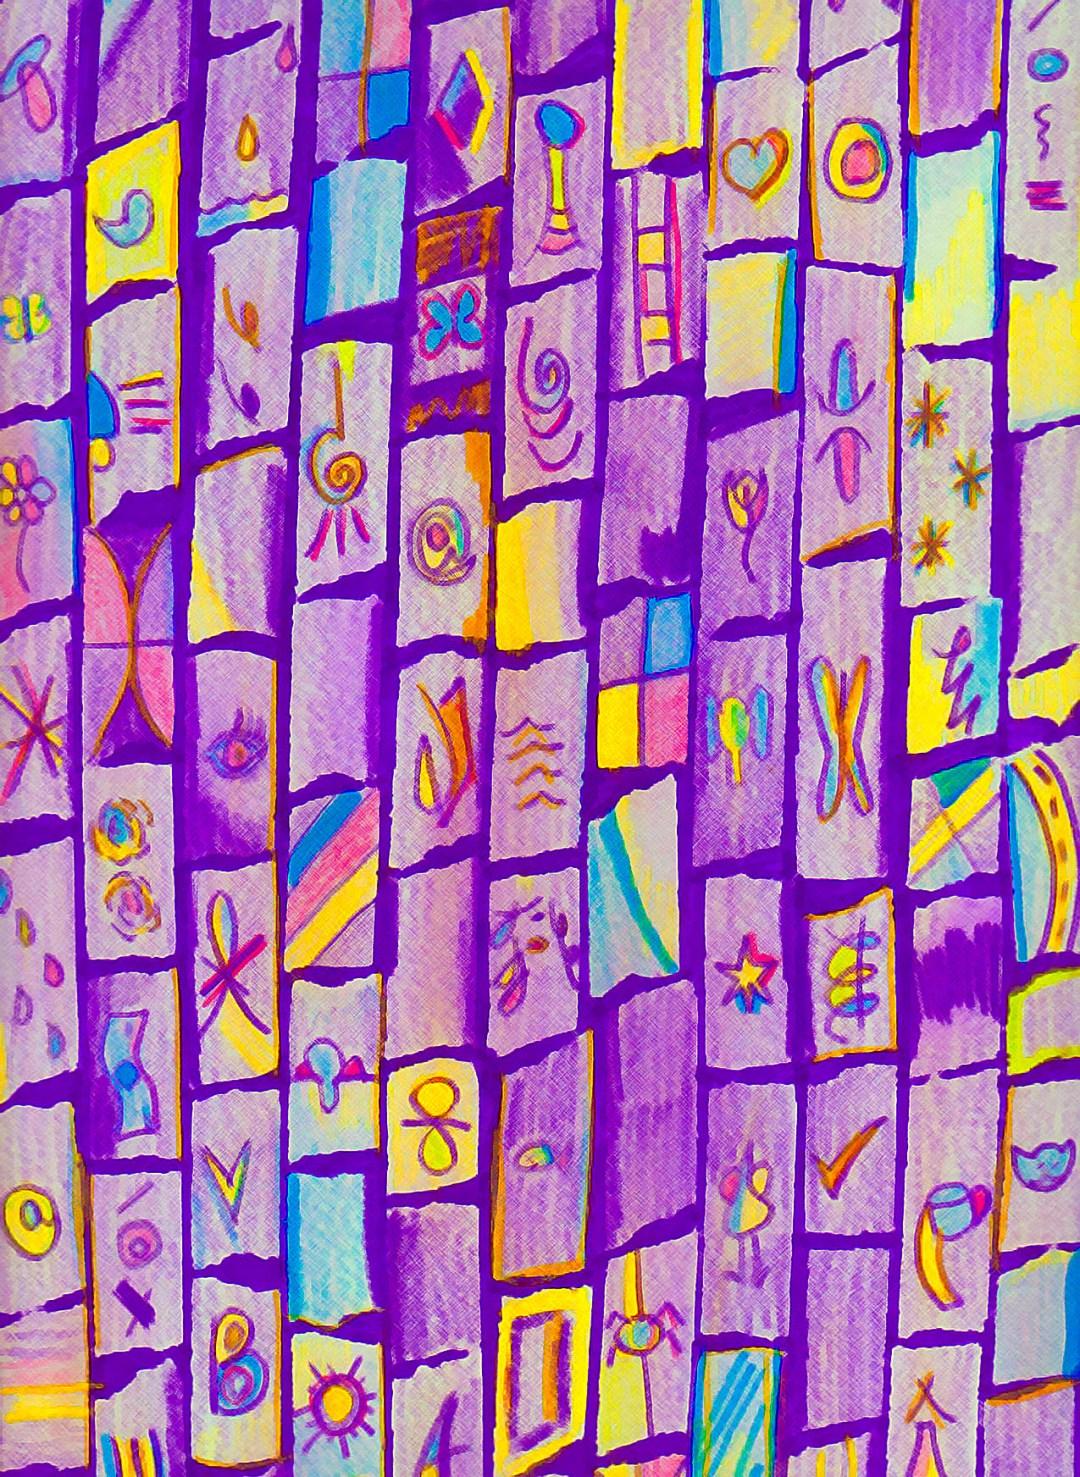 Sharp Purple Bricks, abstract art by Audra Arr.